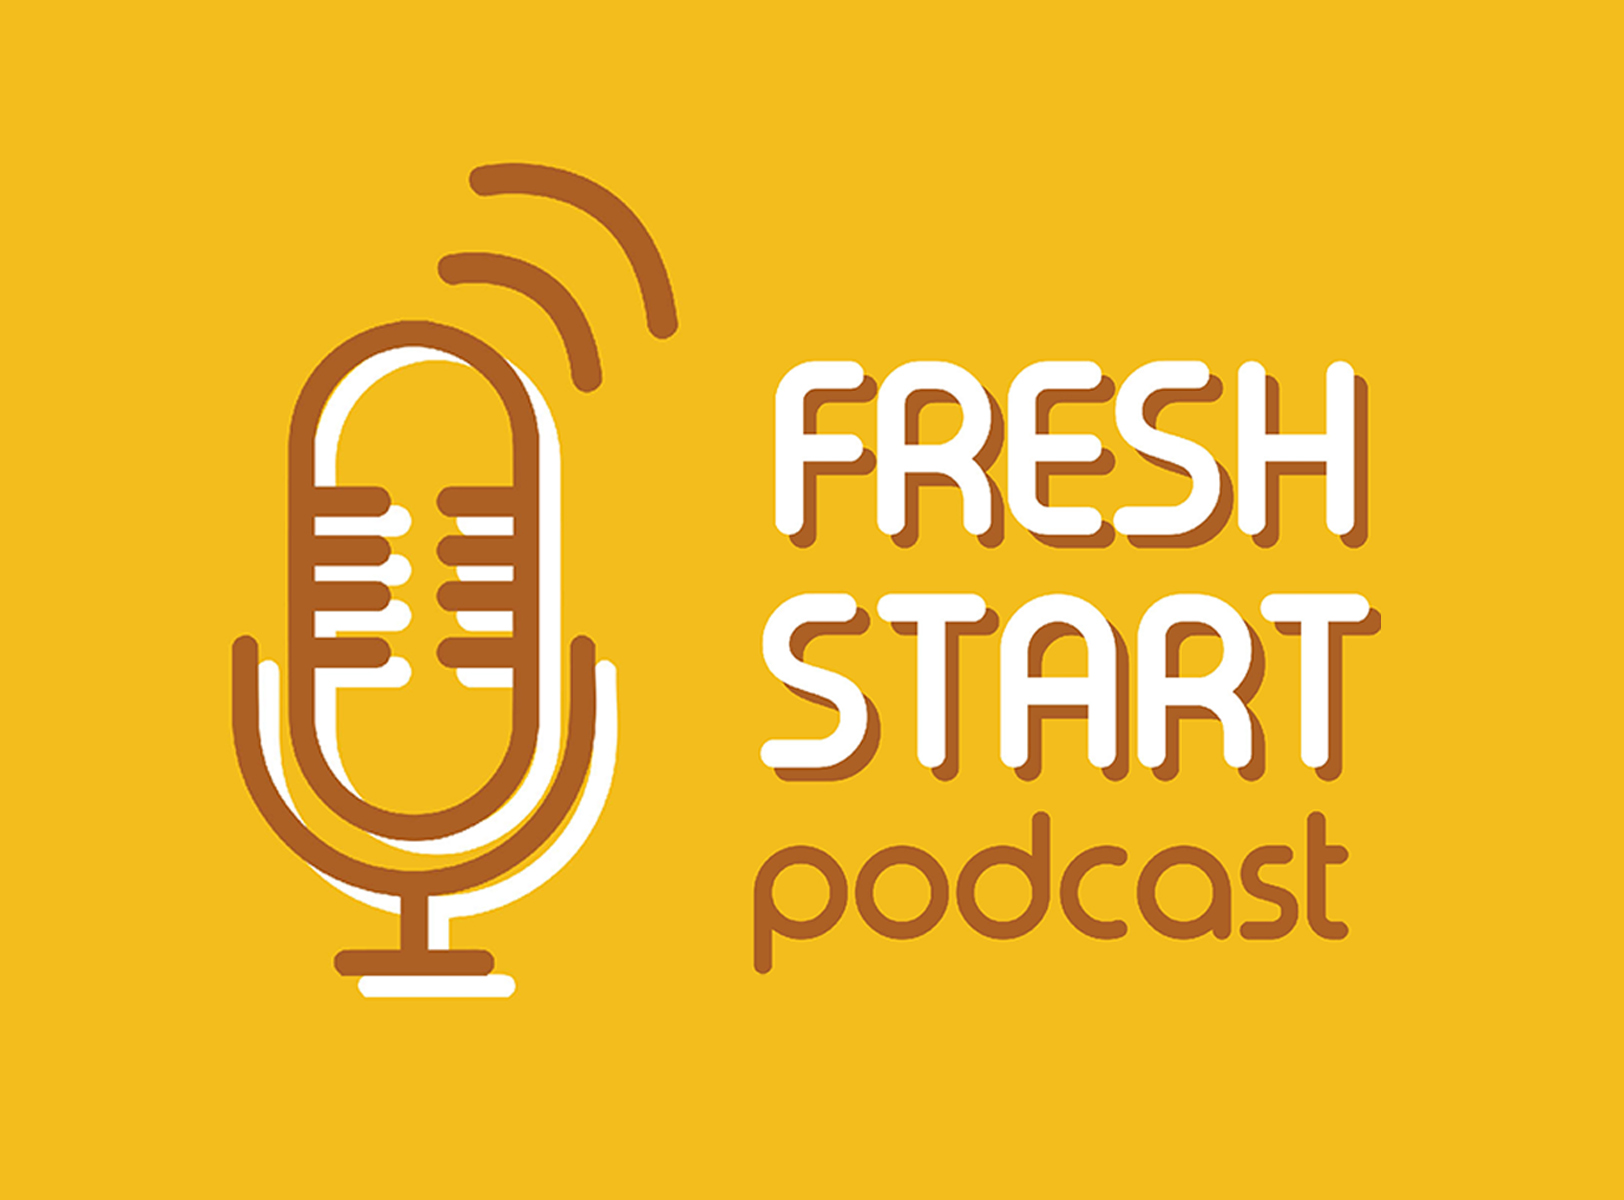 Fresh Start: Podcast News (11/8/2019 Fri.)